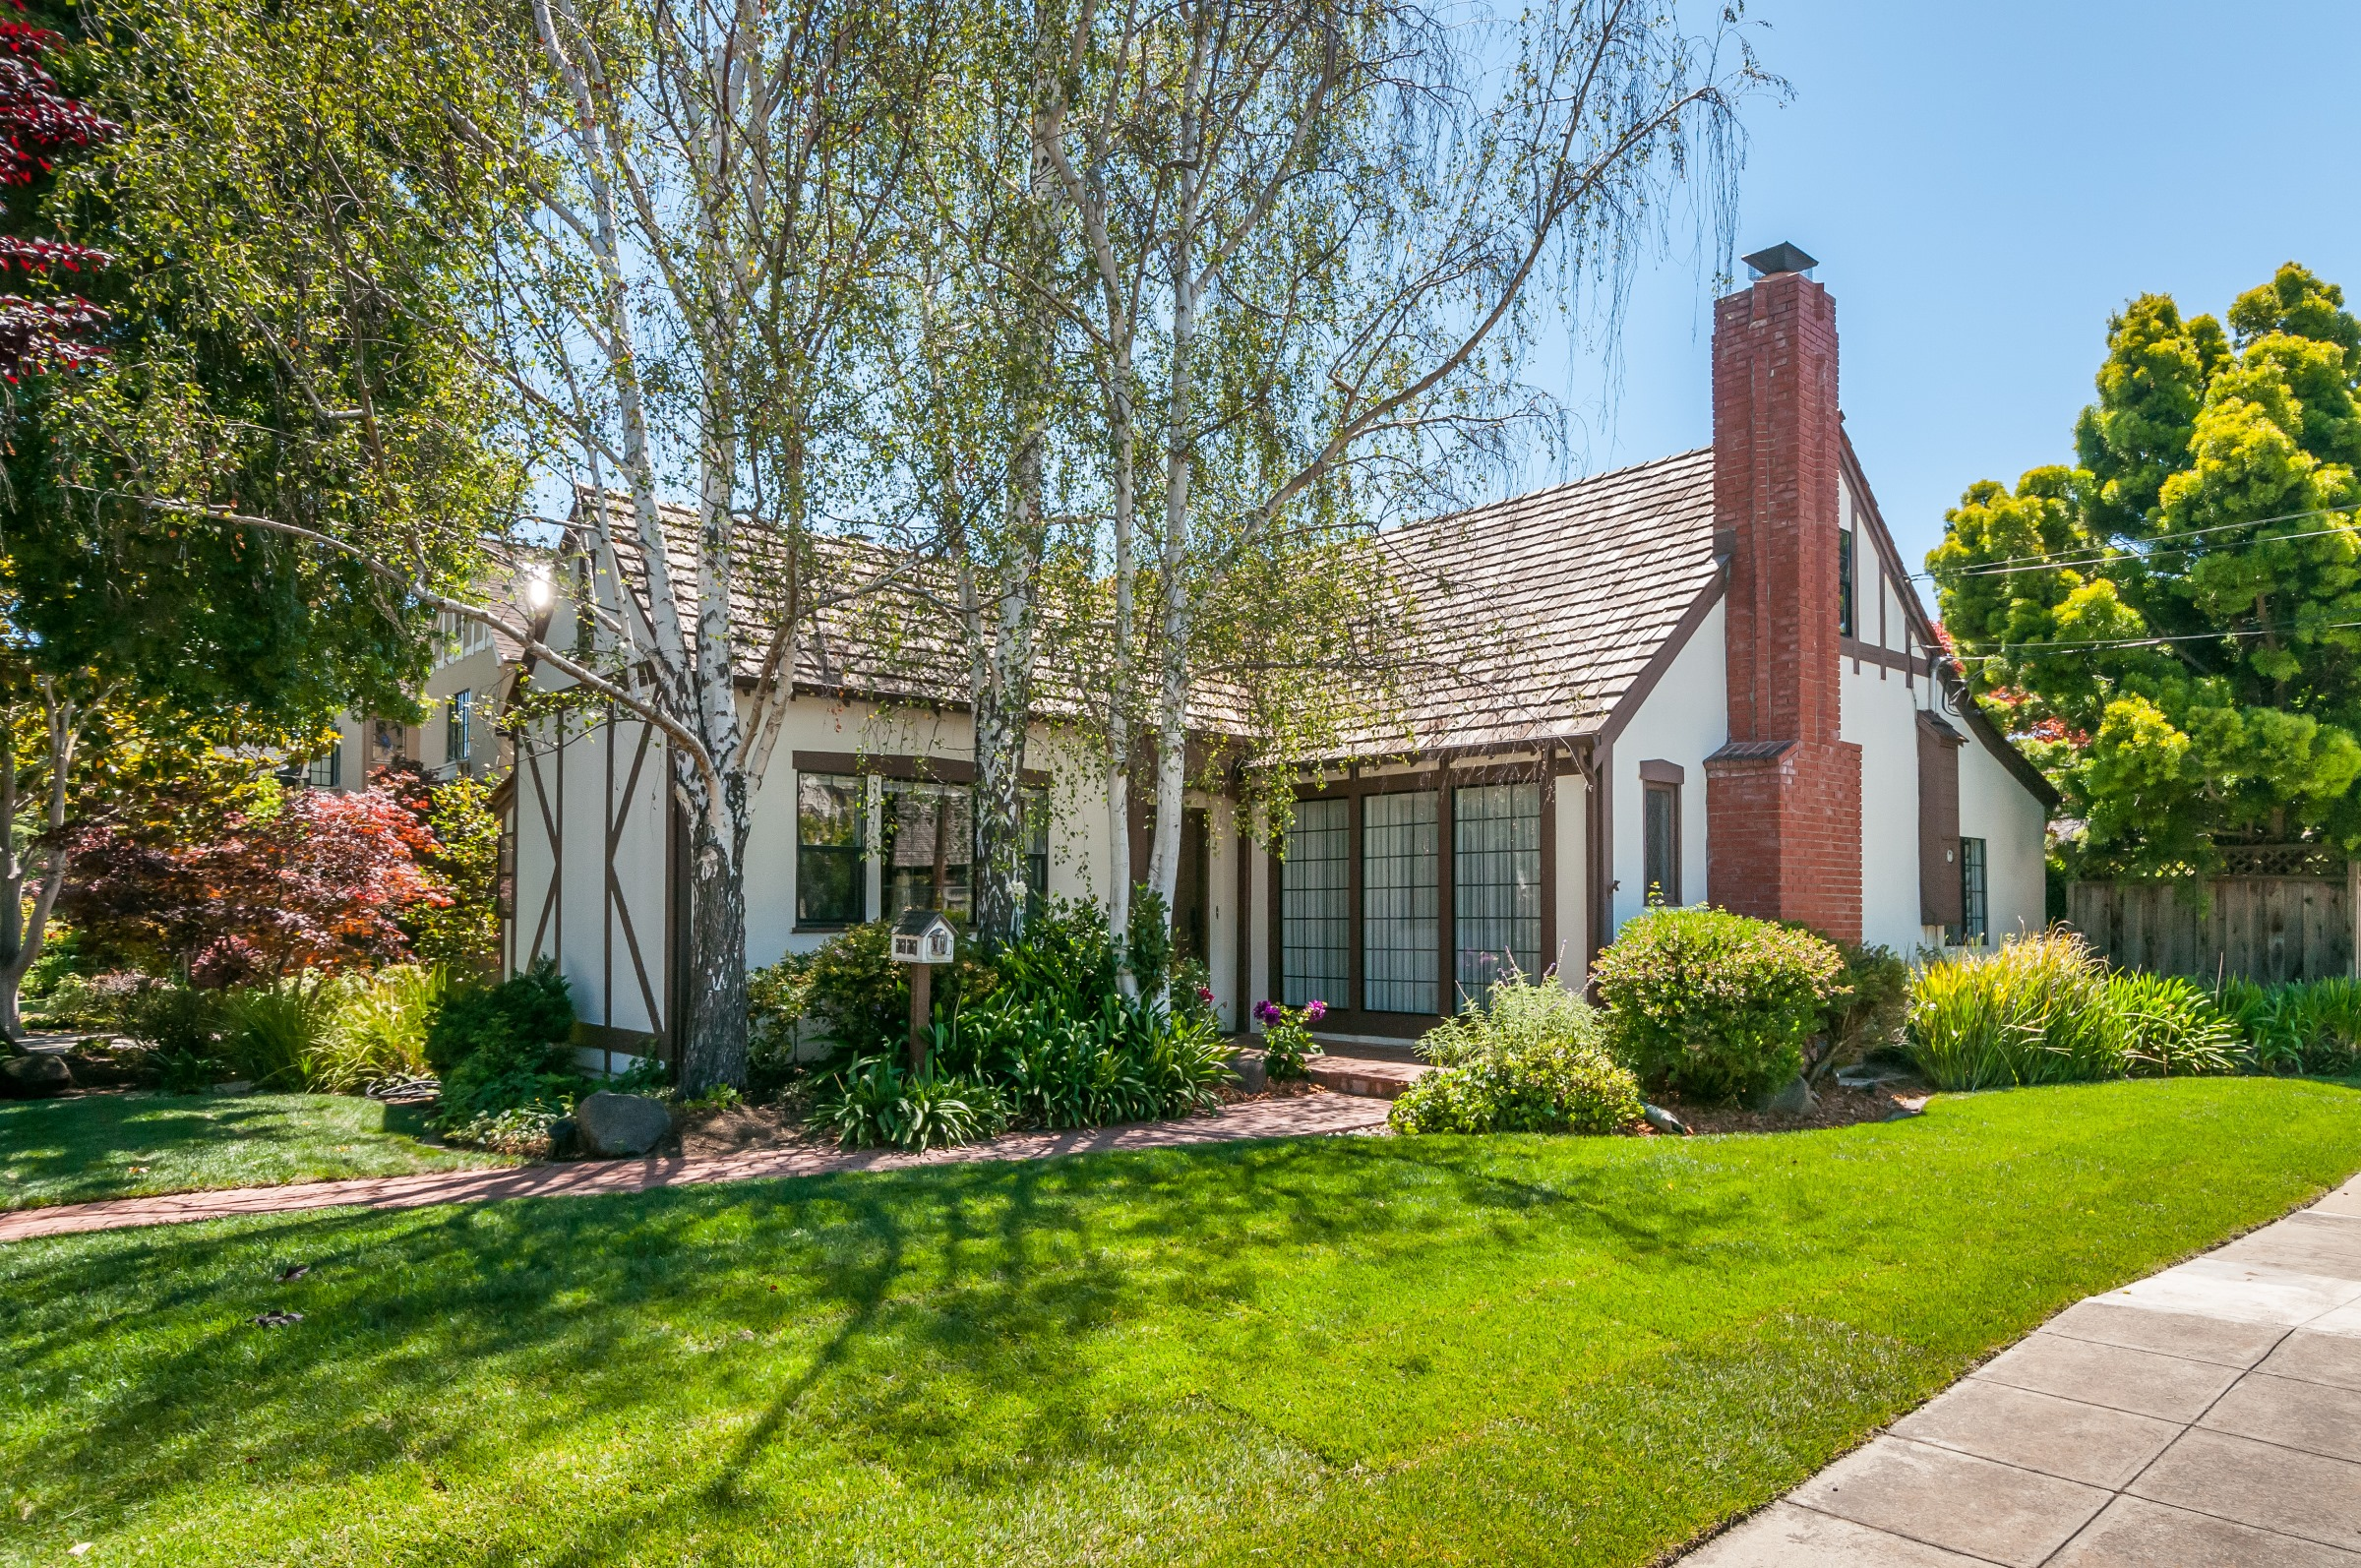 1789 Belburn Dr, Belmont, CA 94002